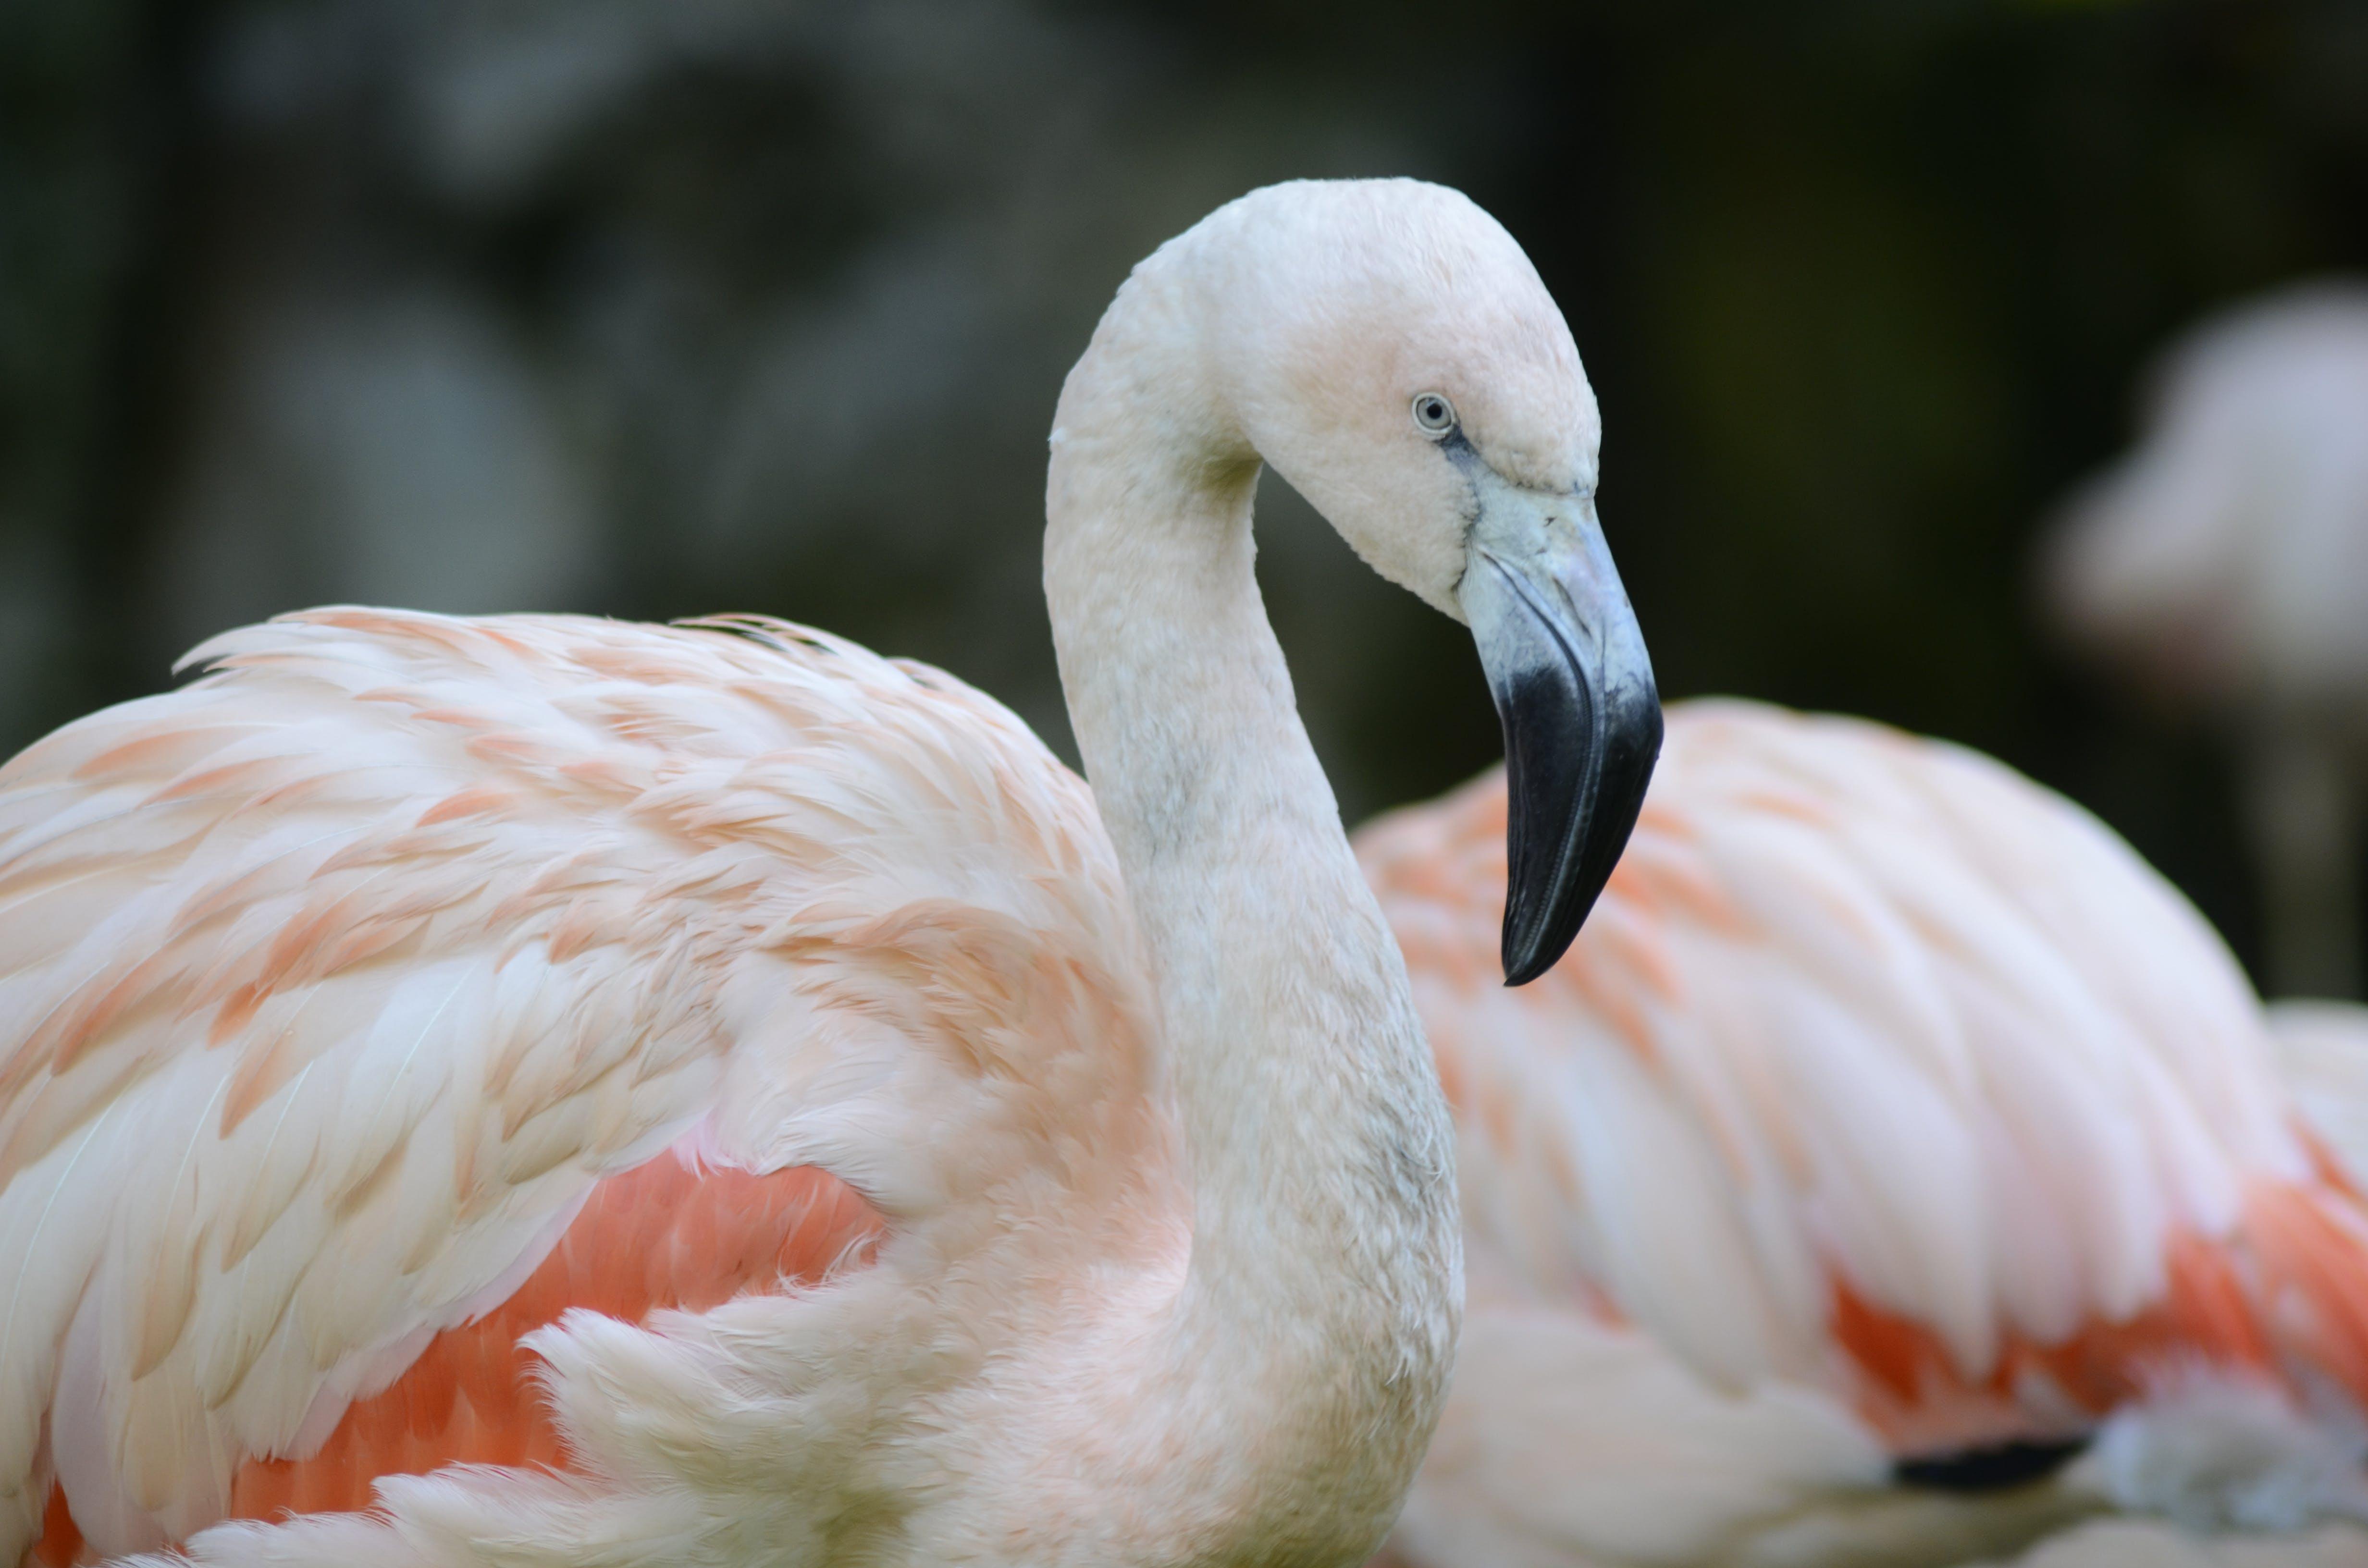 Closeup Photo of White and Orange Bird